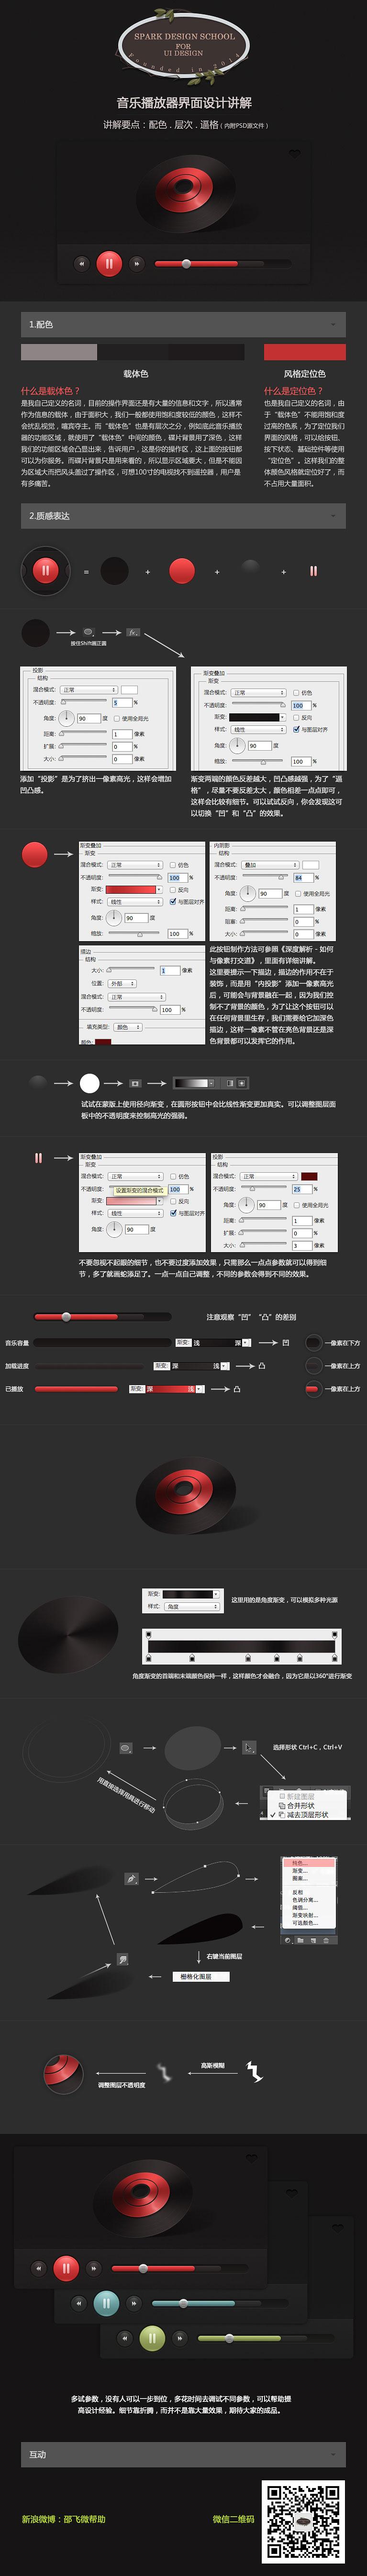 PS教程:音乐播放器界面设计讲解